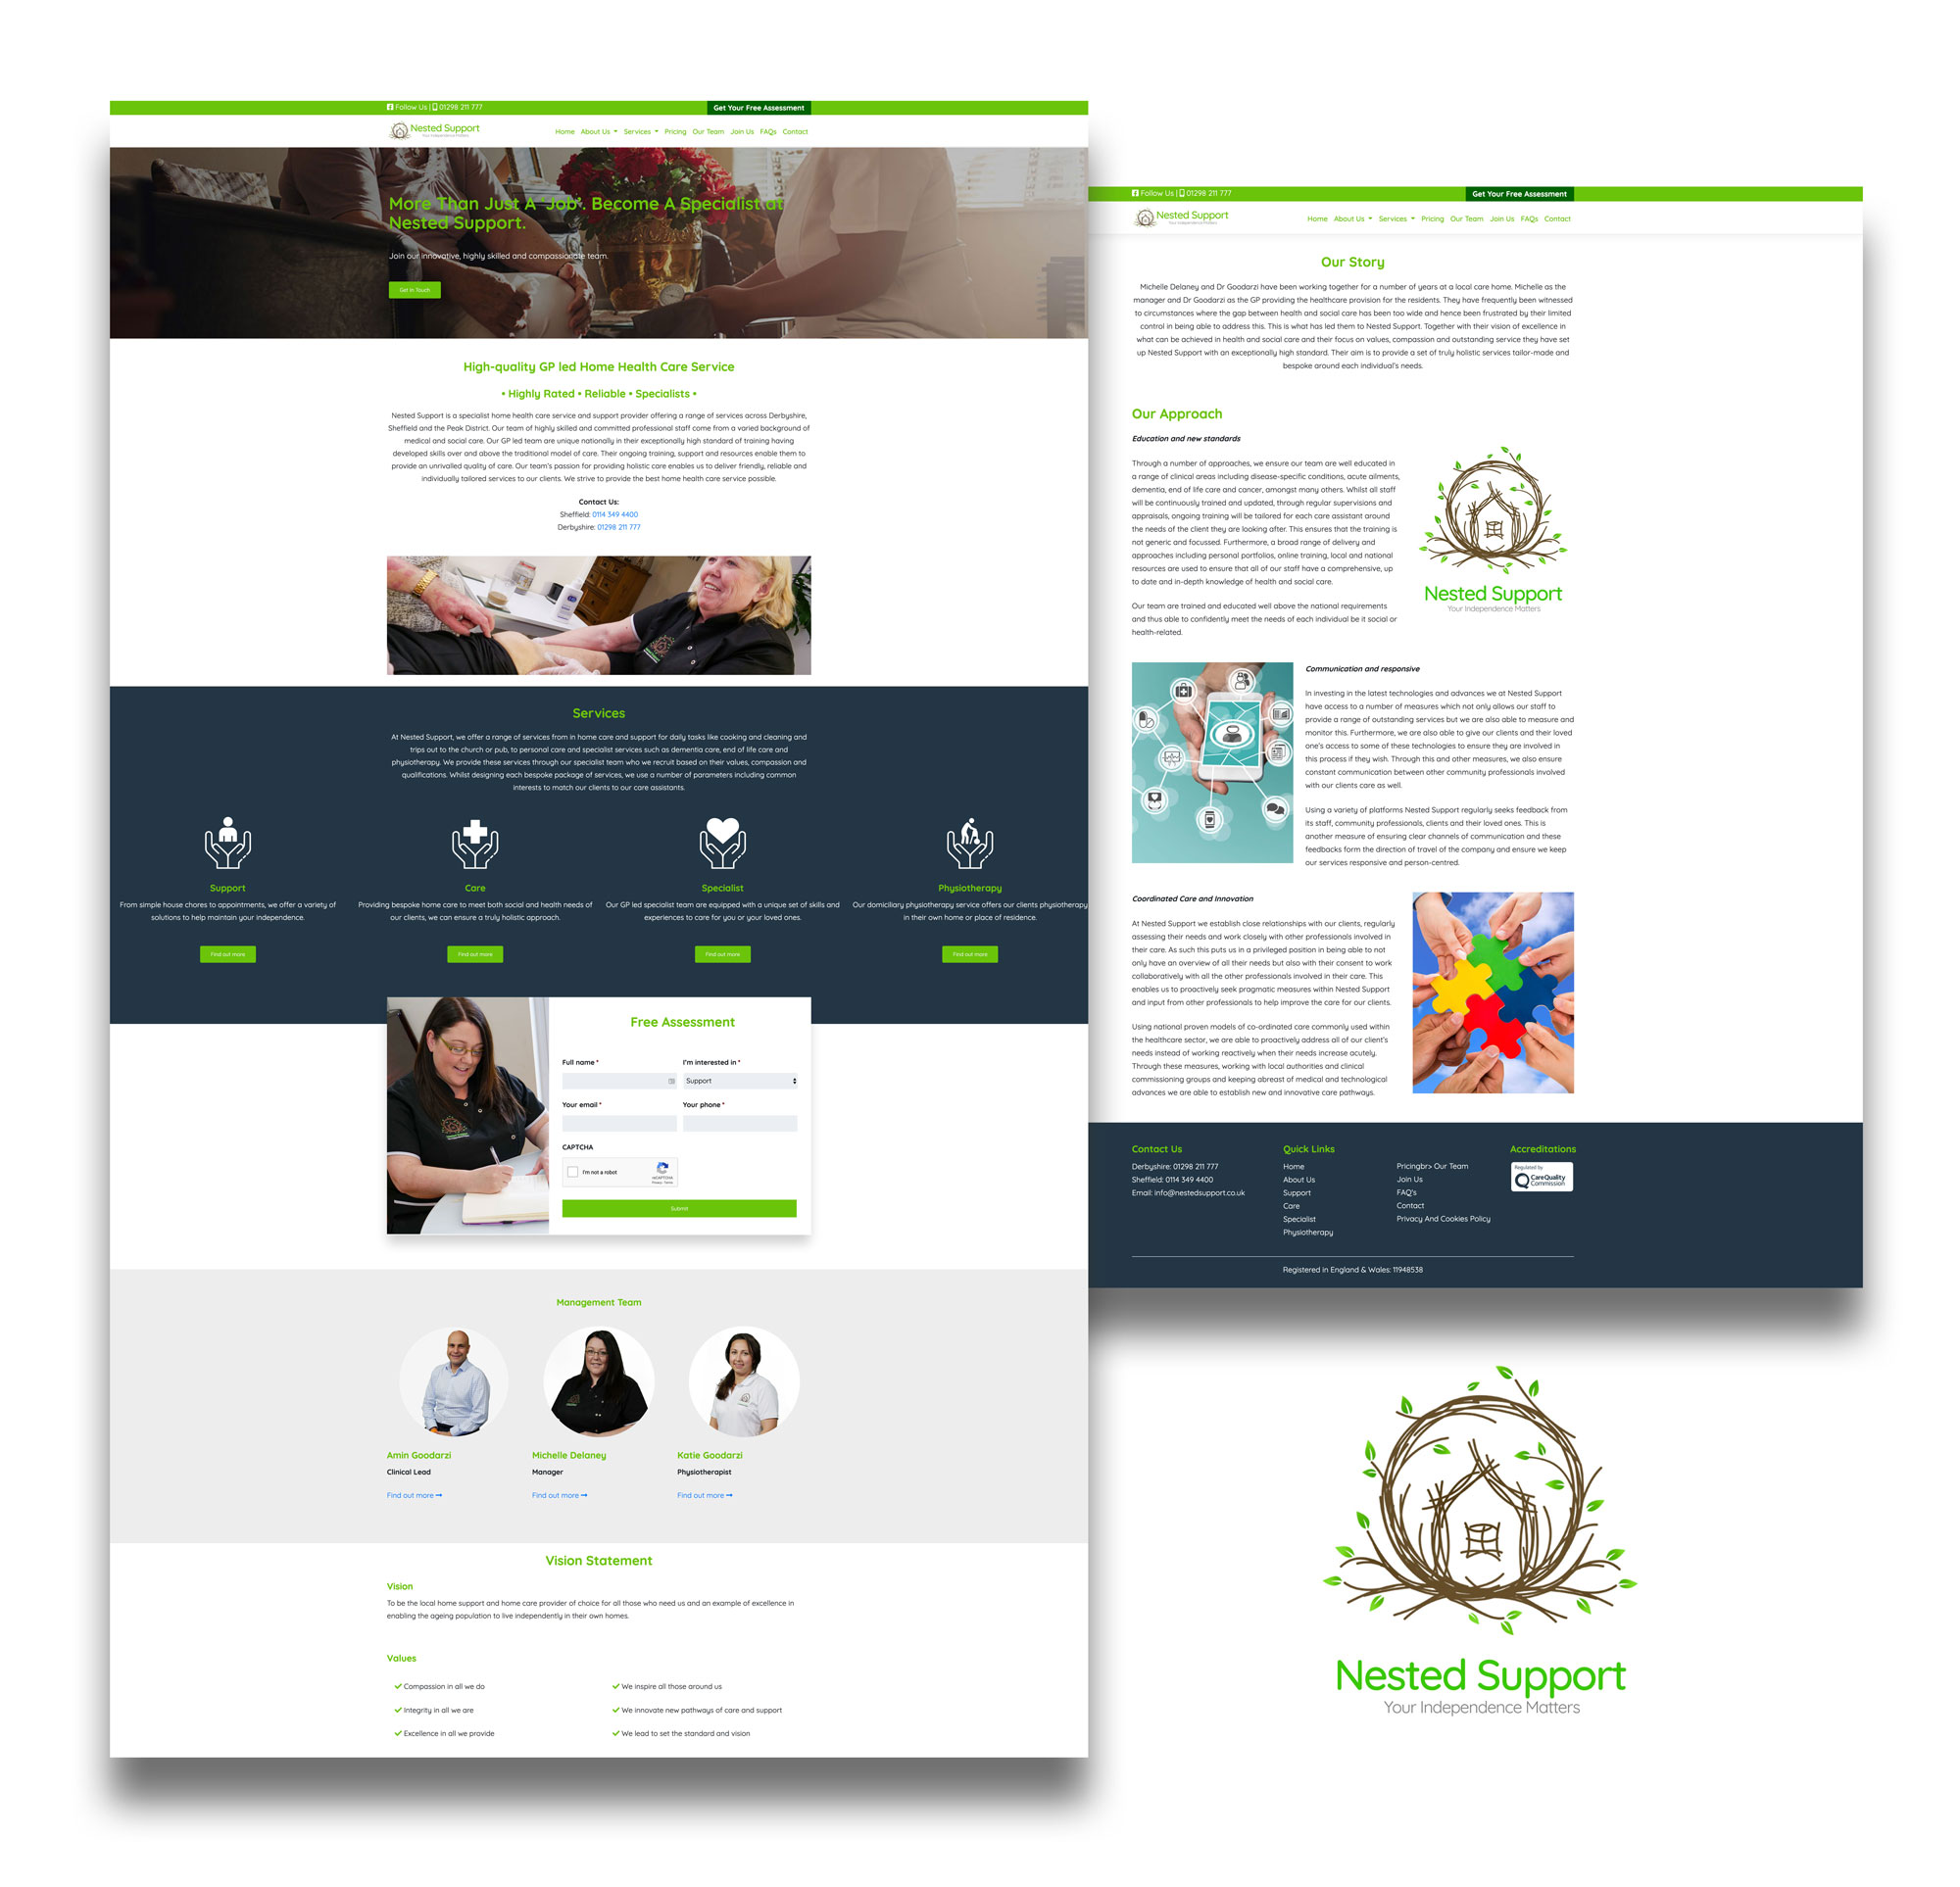 nested support website image